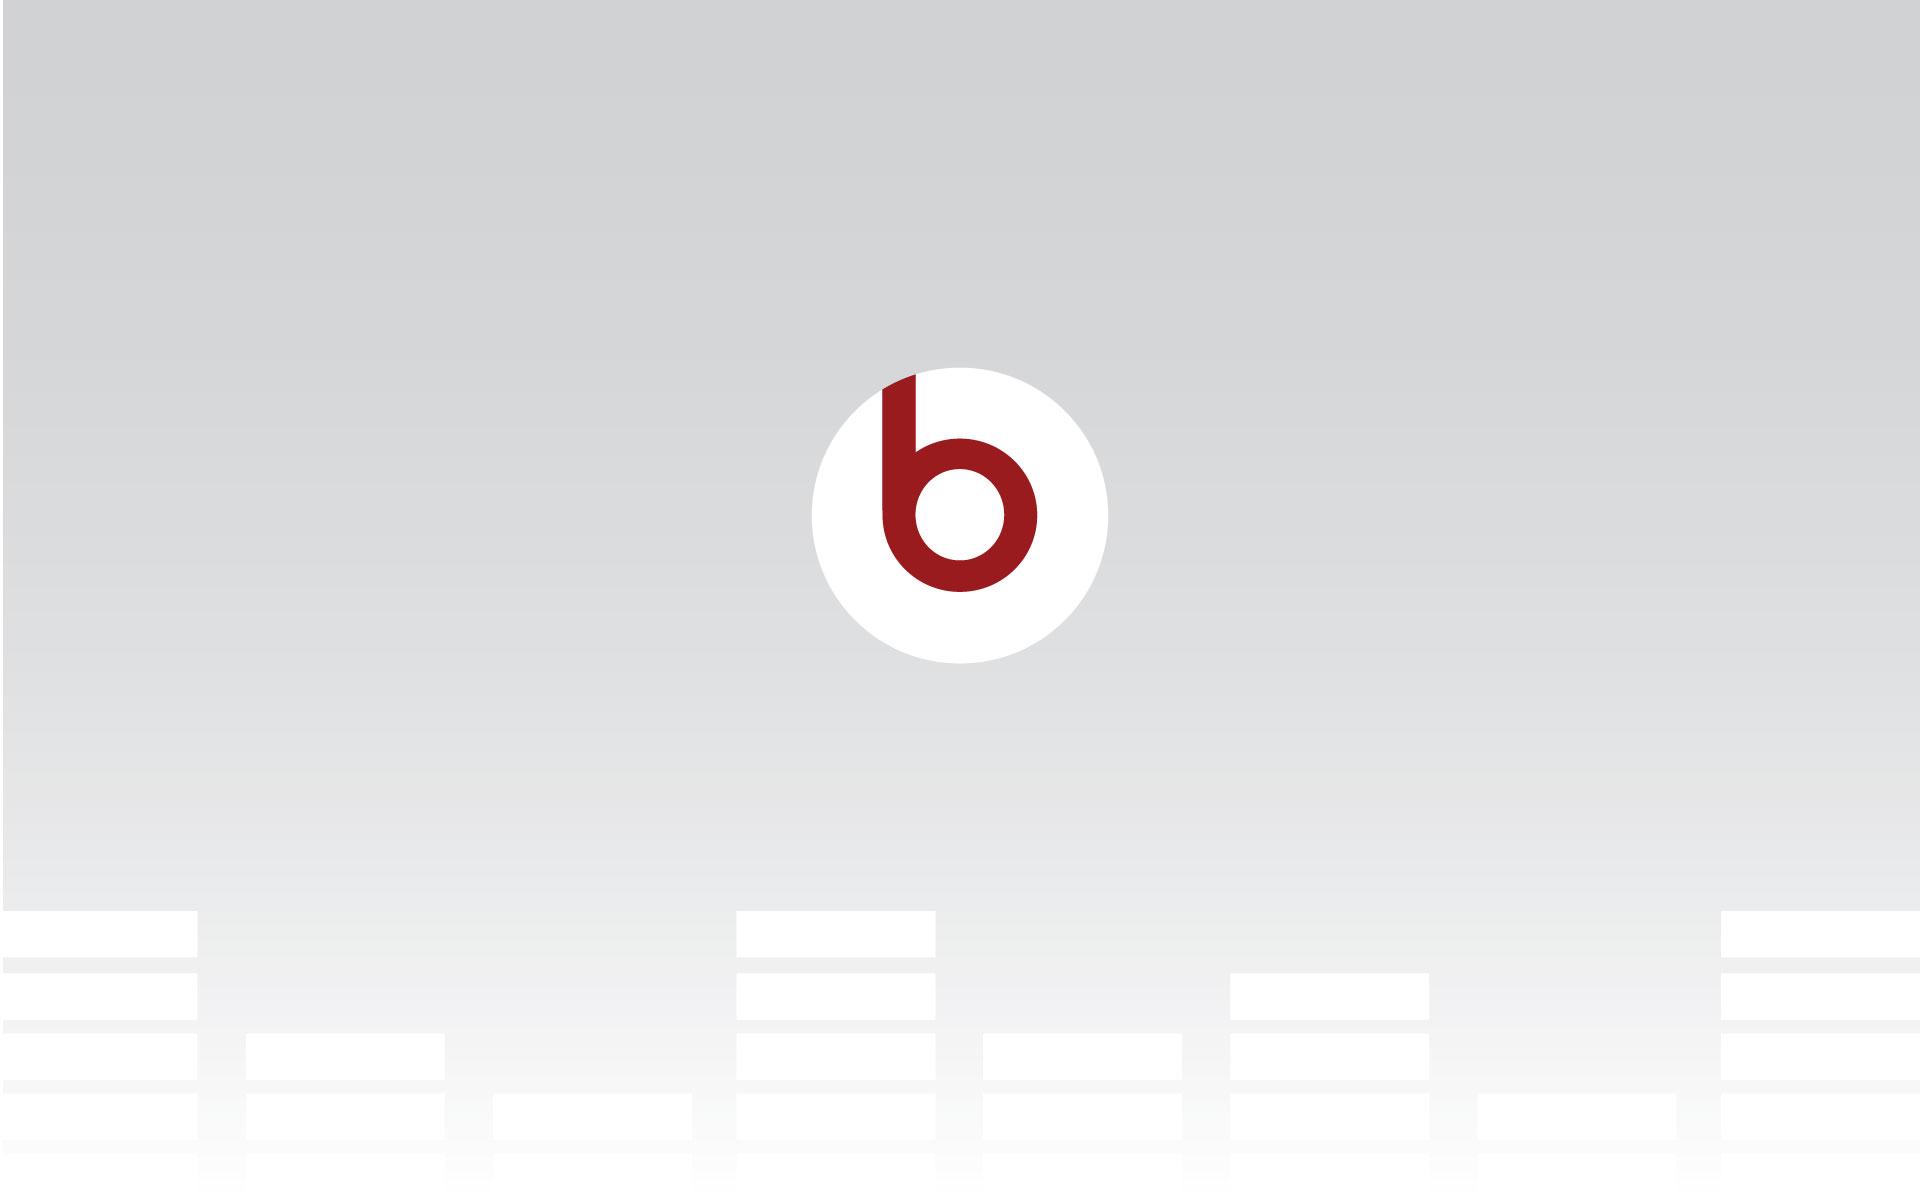 Beats By Dre Wallpaper px HDWallSource